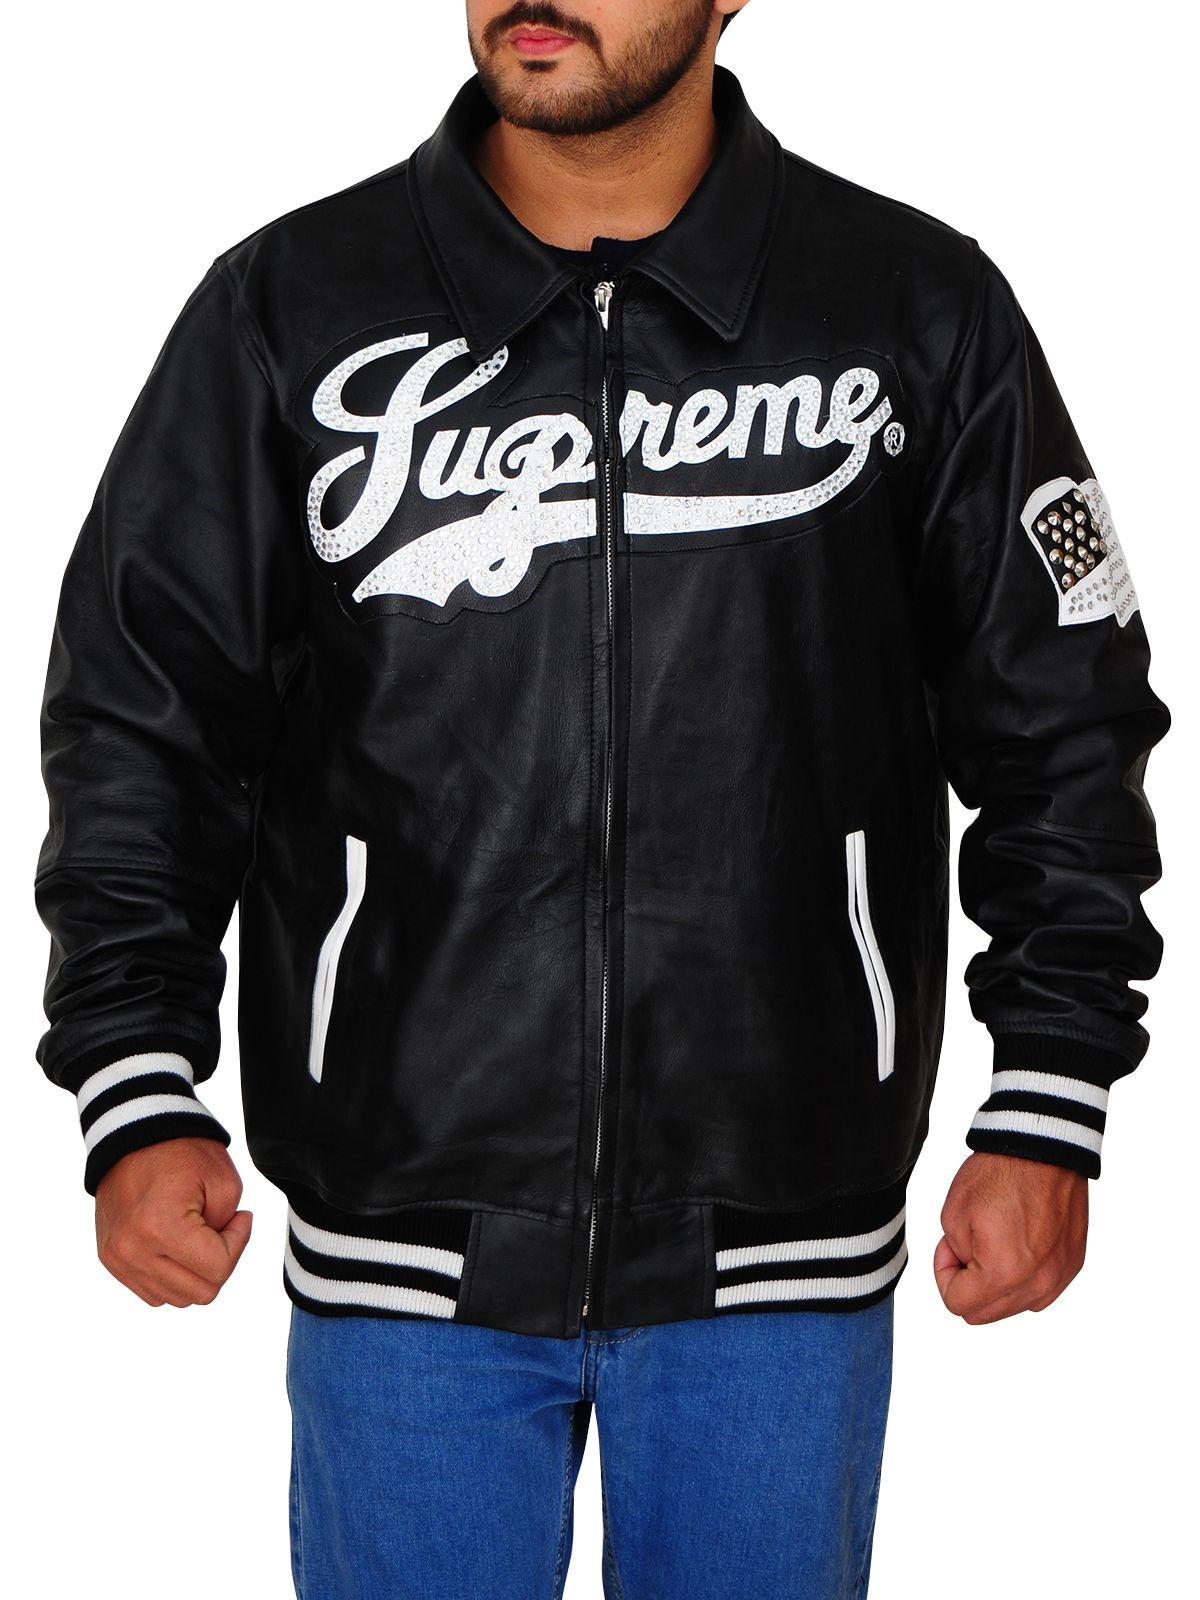 Men S Supreme Black Bomber Leather Jacket Men Jacket Mauvetree Leather Jacket Men Mens Fashion Summer Mens Fashion Casual [ 1600 x 1200 Pixel ]